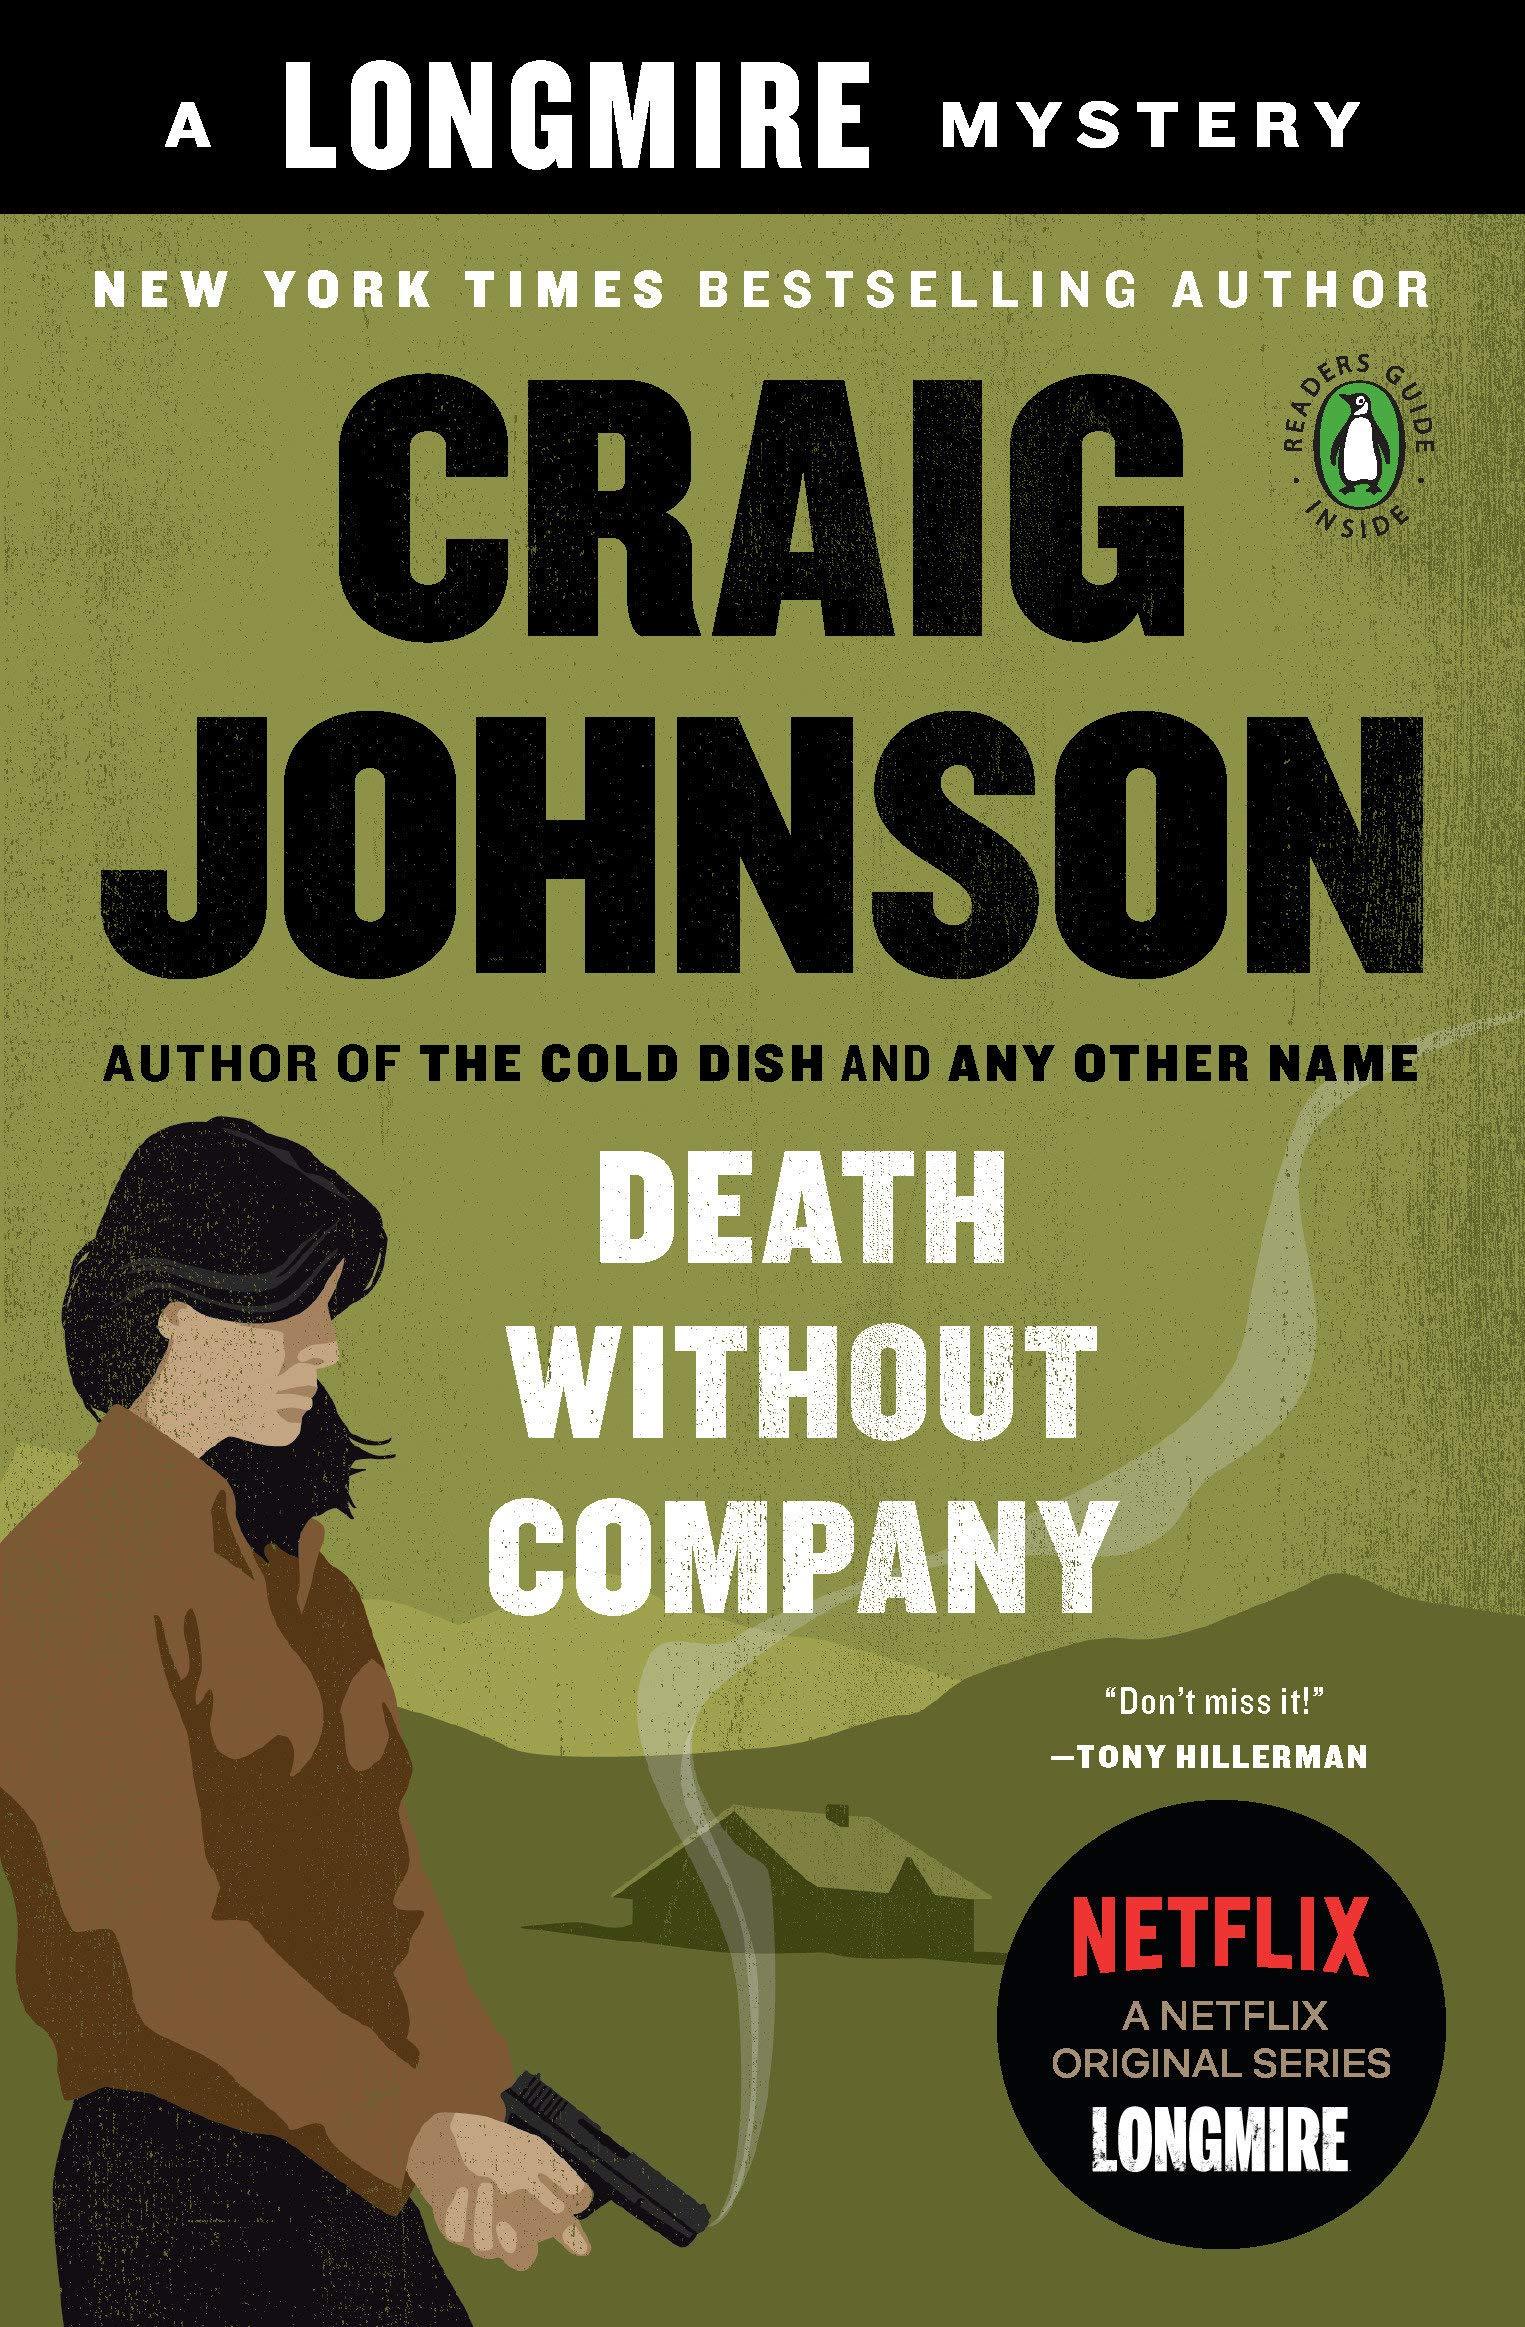 3de487aa6e0 Amazon.fr - Death Without Company  A Longmire Mystery - Craig ...